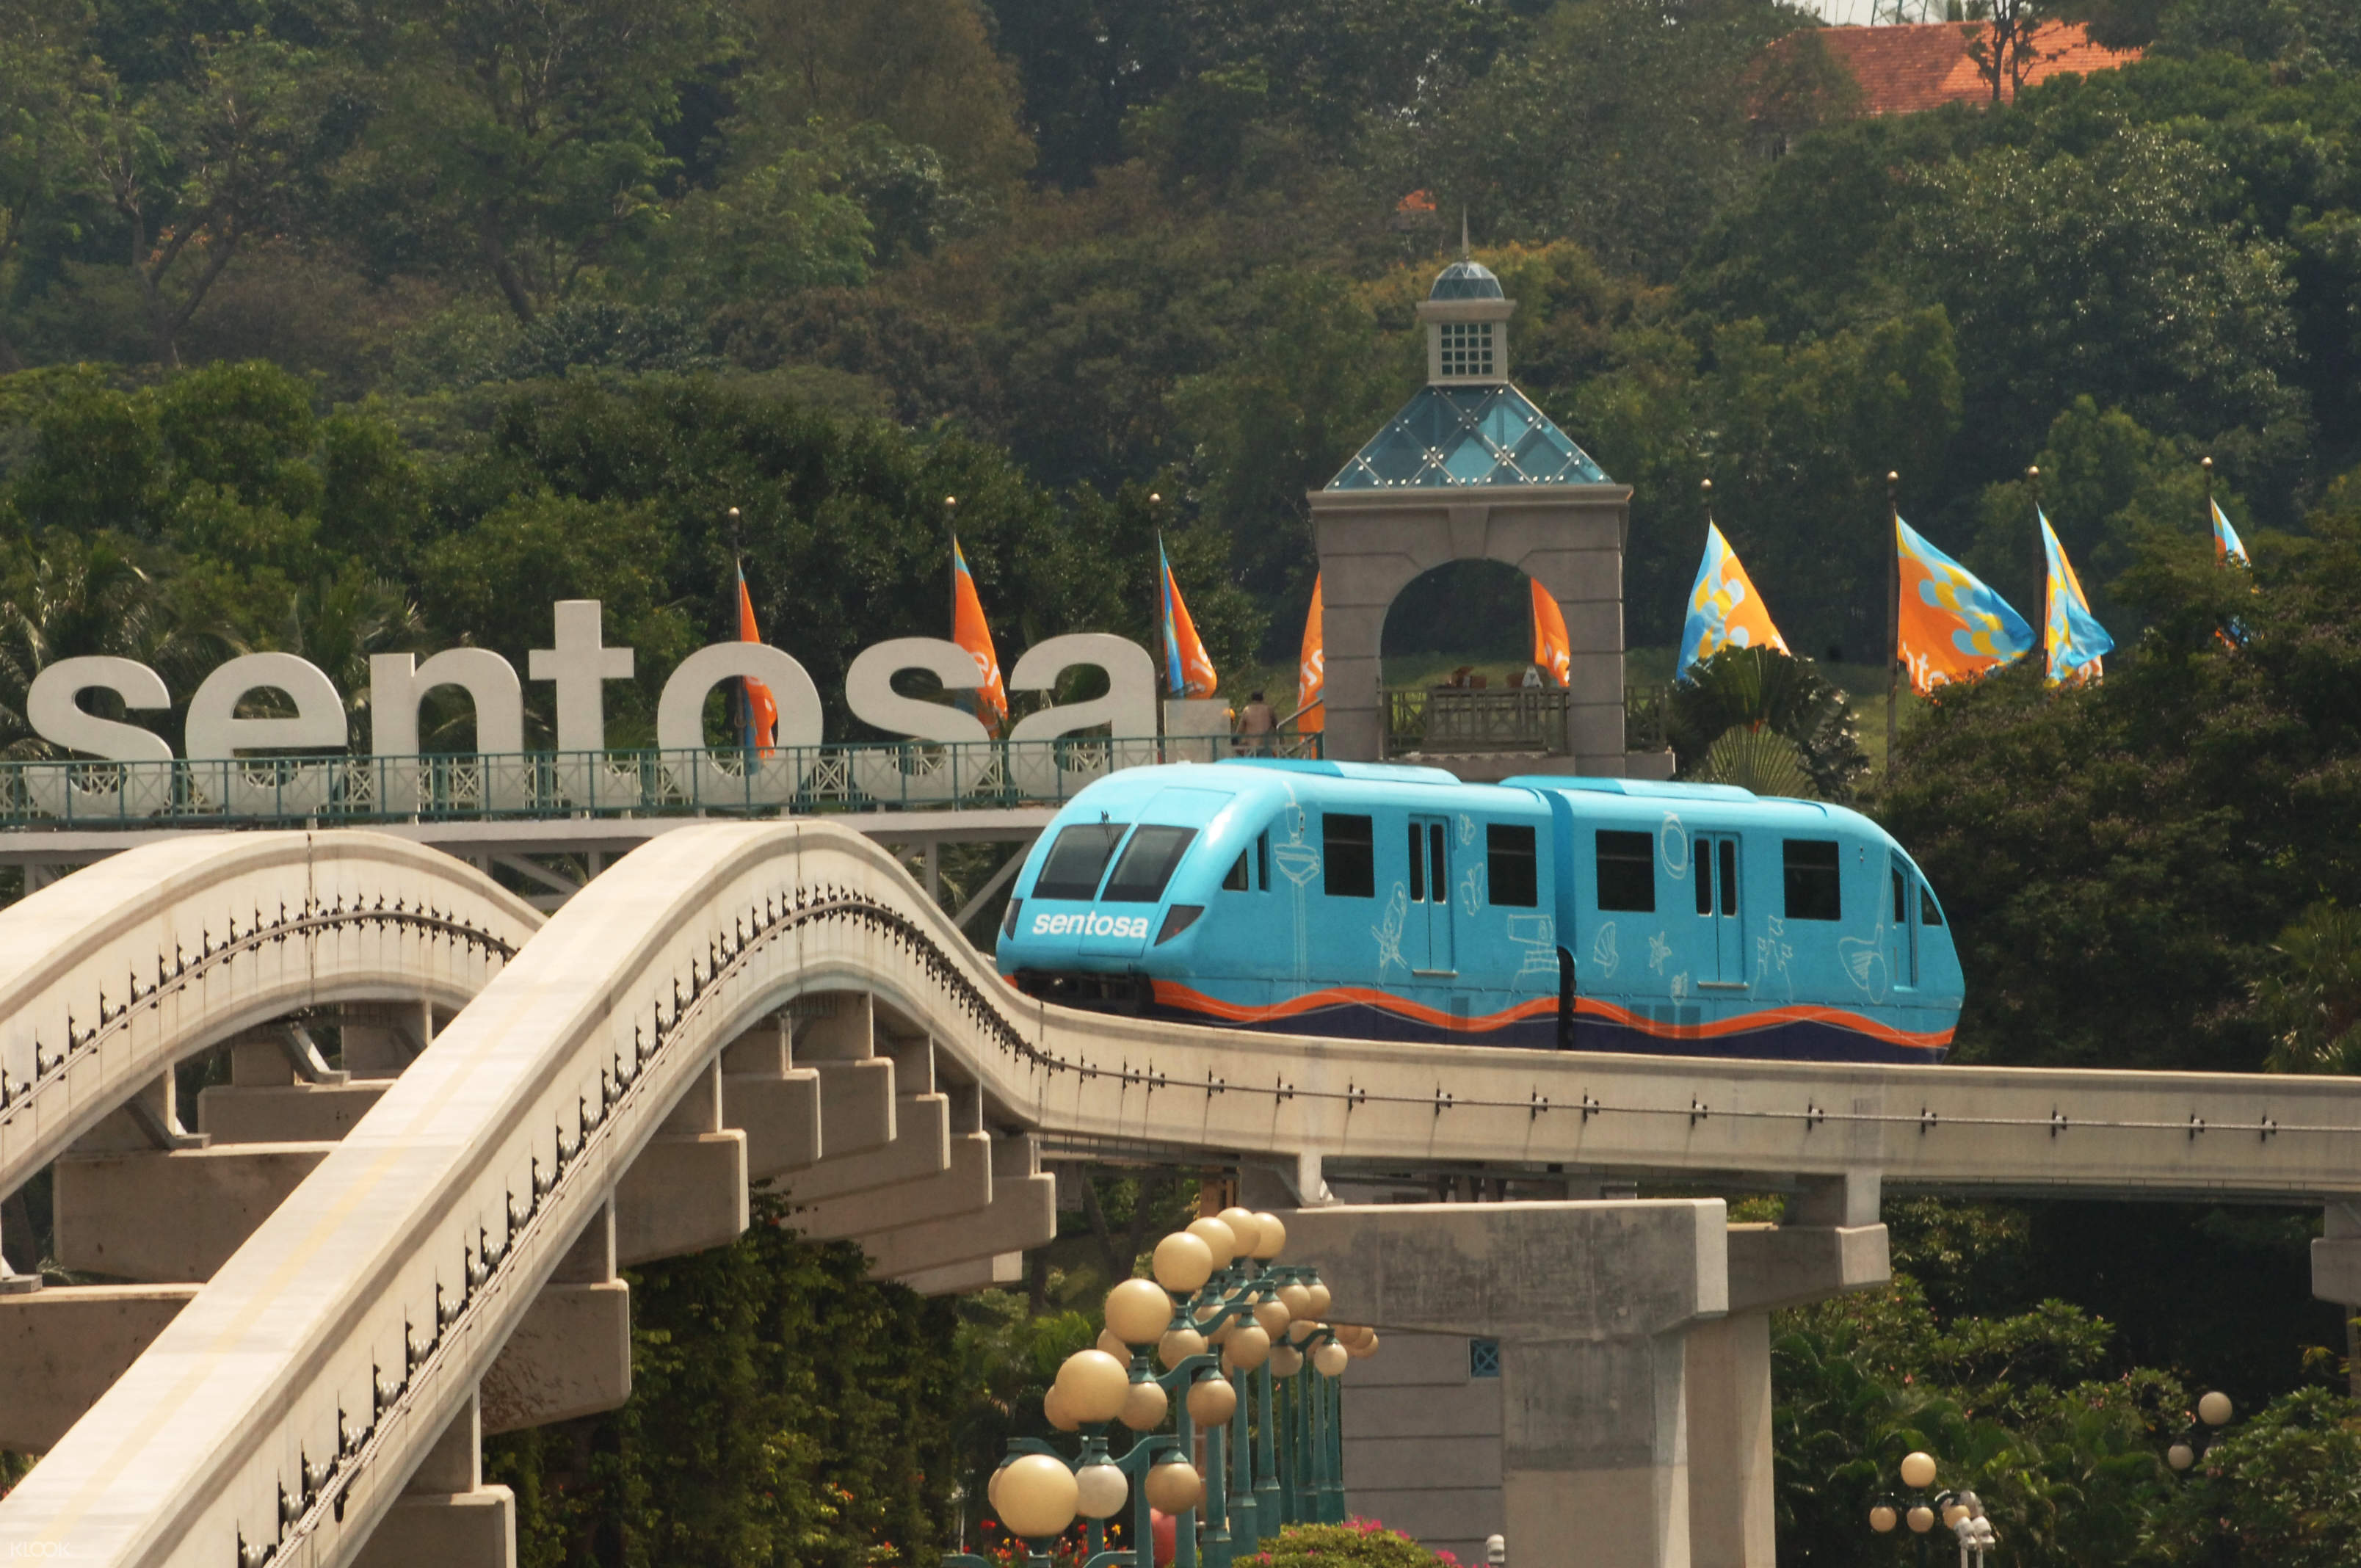 Sentosa Express Monorail